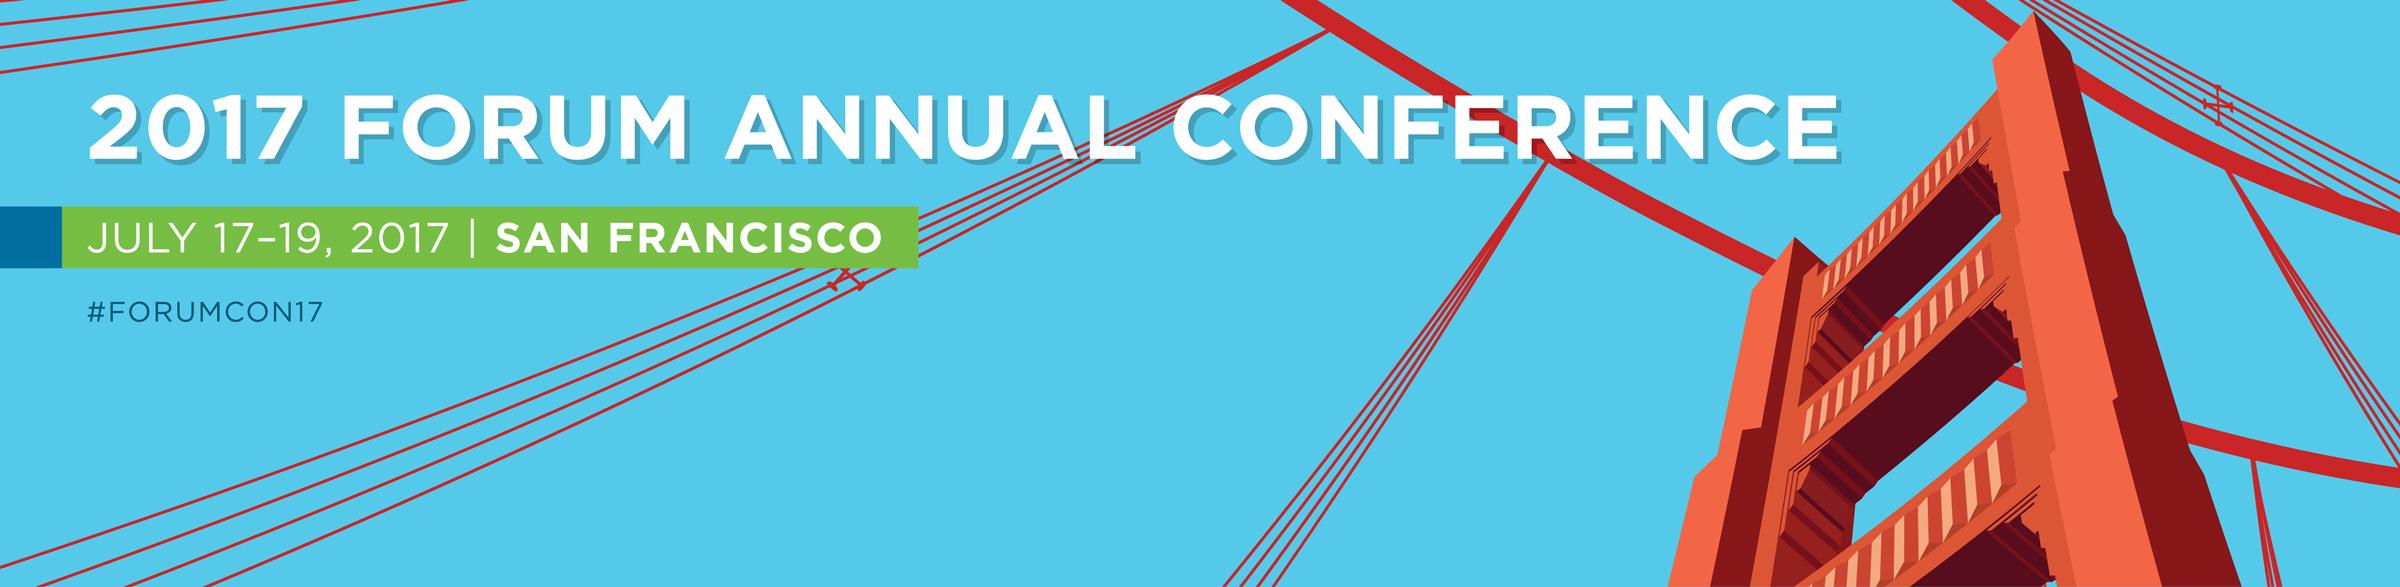 2017 Forum Annual Conference   United Philanthropy Forum 30bd16b1c707